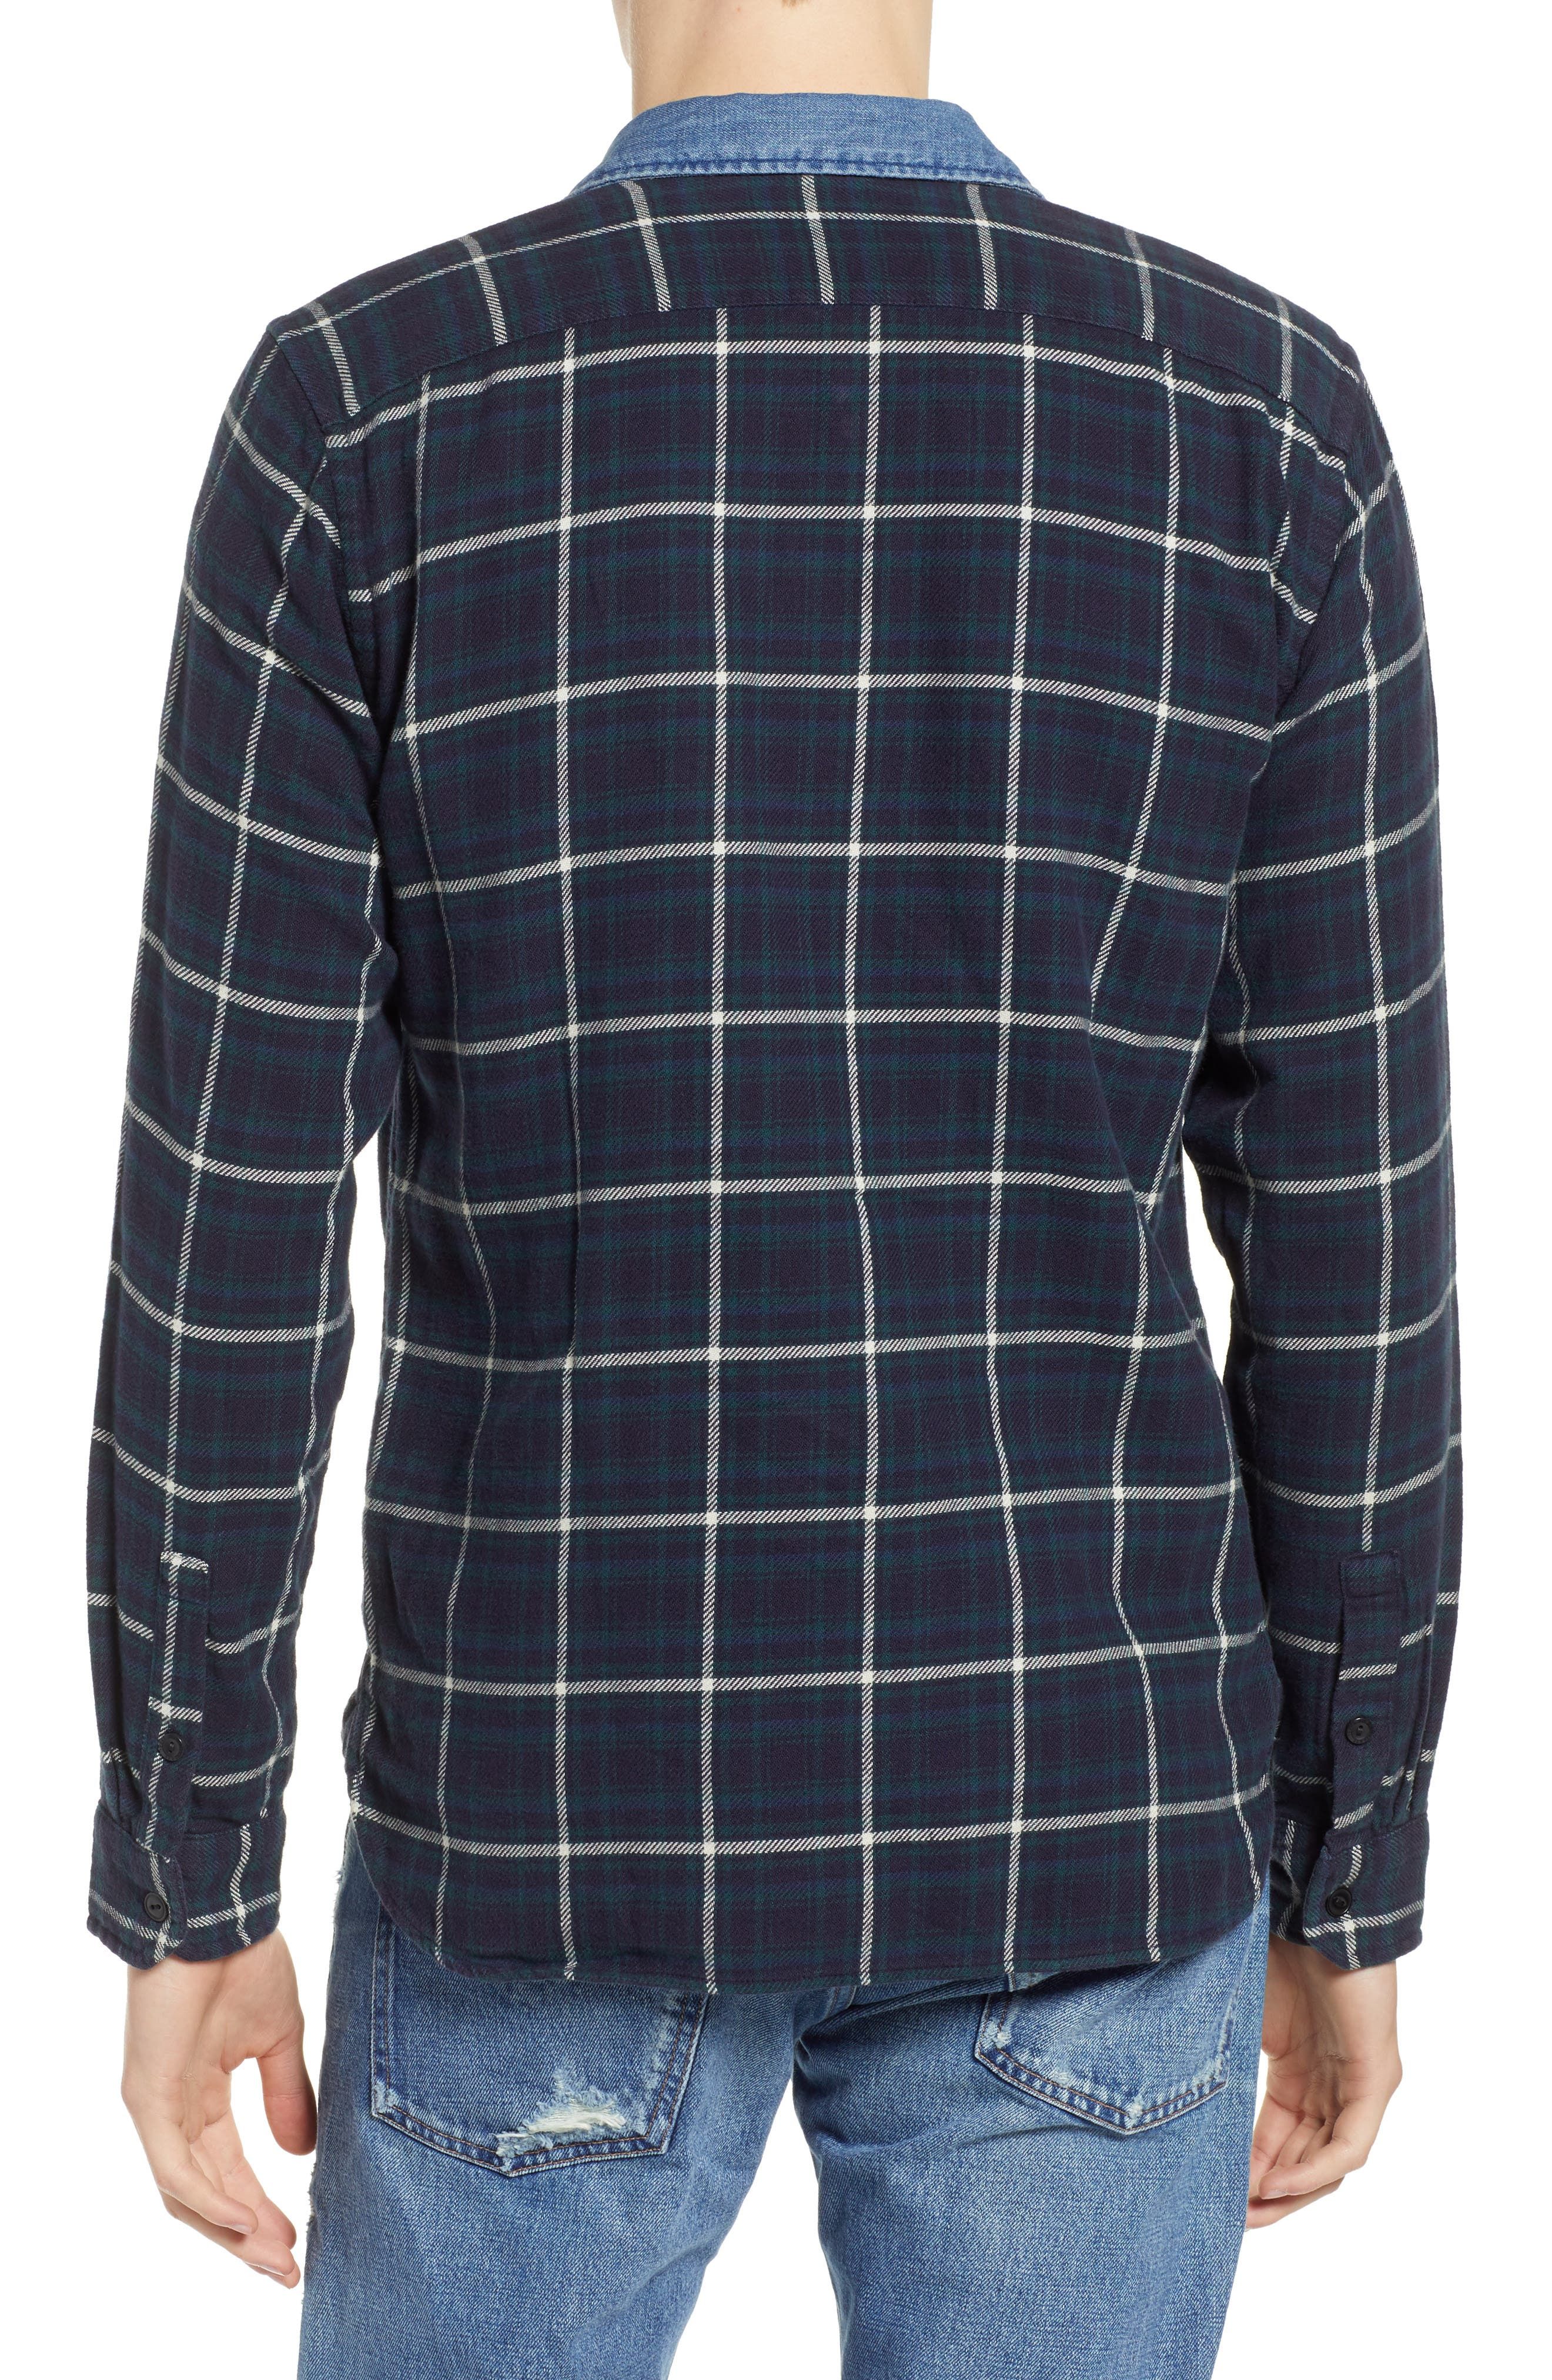 x Justin Timberlake Slim Fit Flannel Worker Shirt,                             Alternate thumbnail 3, color,                             HALLET NIGHT SKY